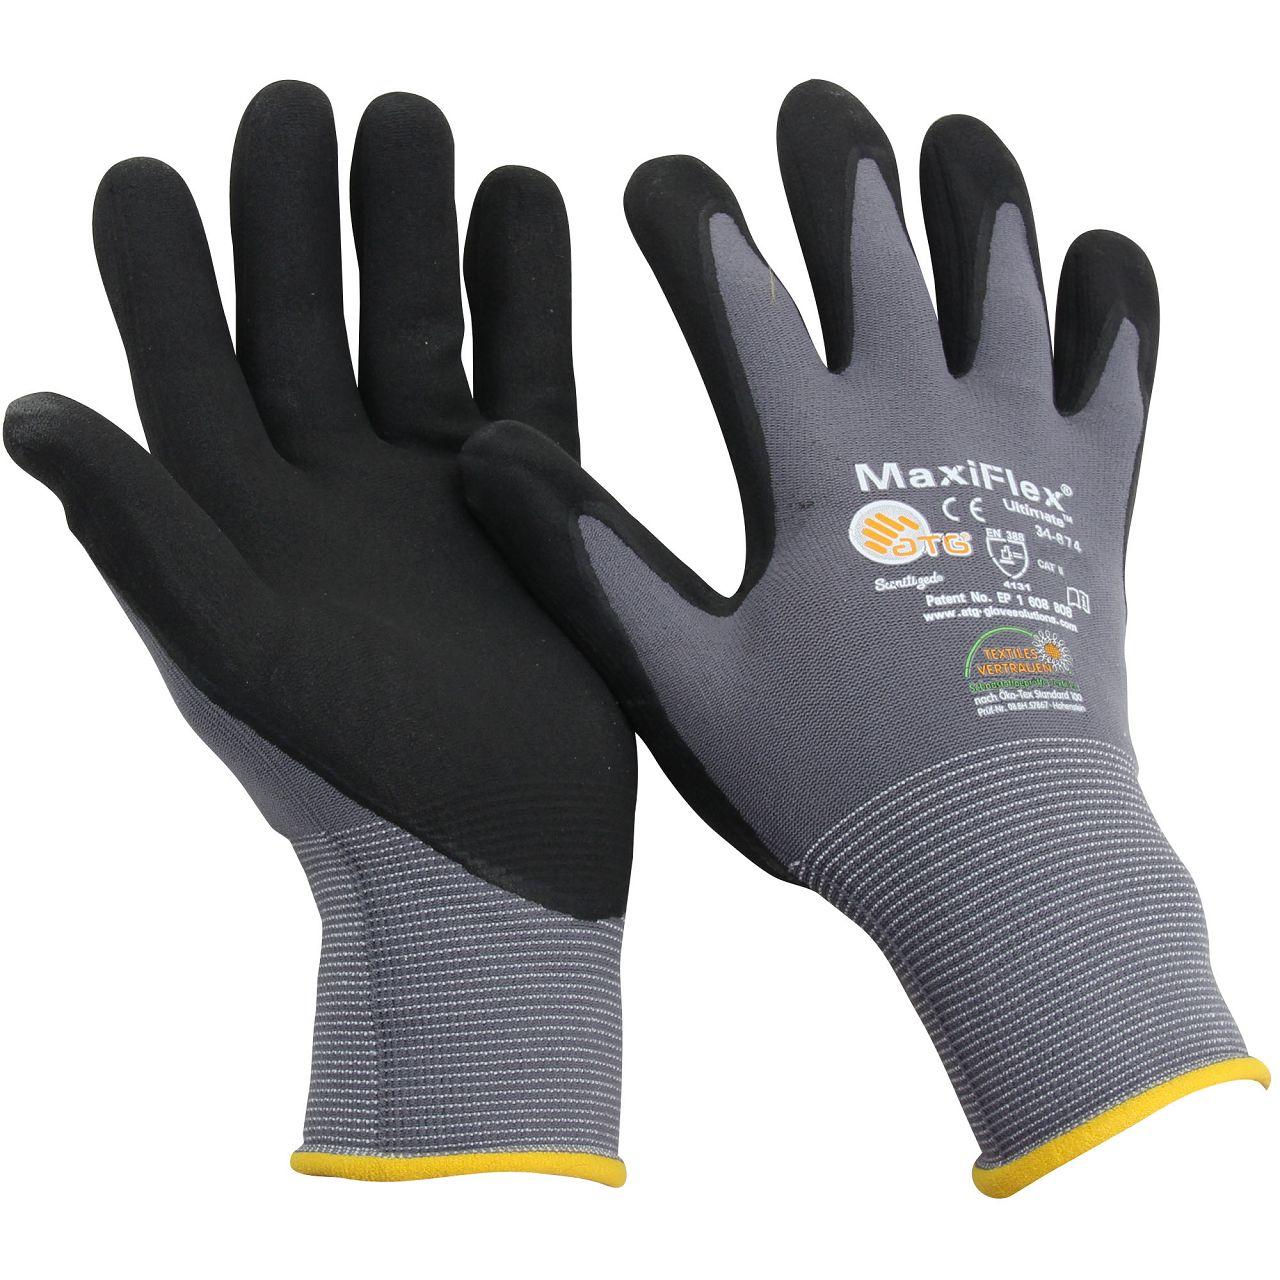 MAXIFLEX Ultimate ATG Texxor Handschuhe Arbeitshandschuhe Größe 8 / M (1 Paar)